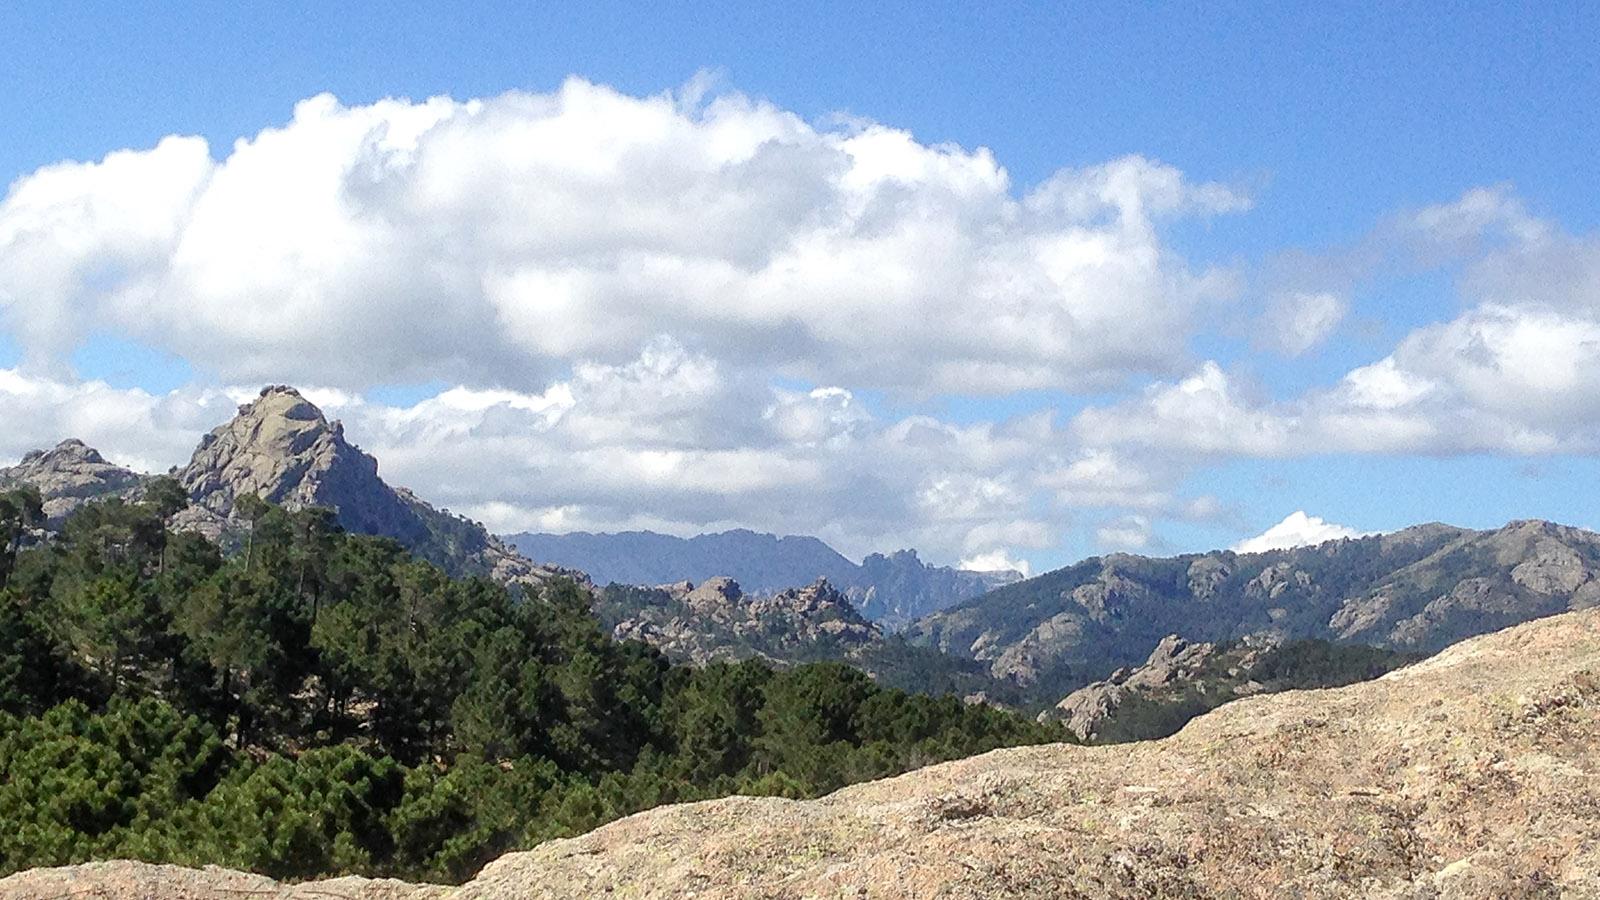 L'Hospedale Das Bavella-Massiv der Alta Rocca grüßt in der Ferne. Foto: Hilke Maunder